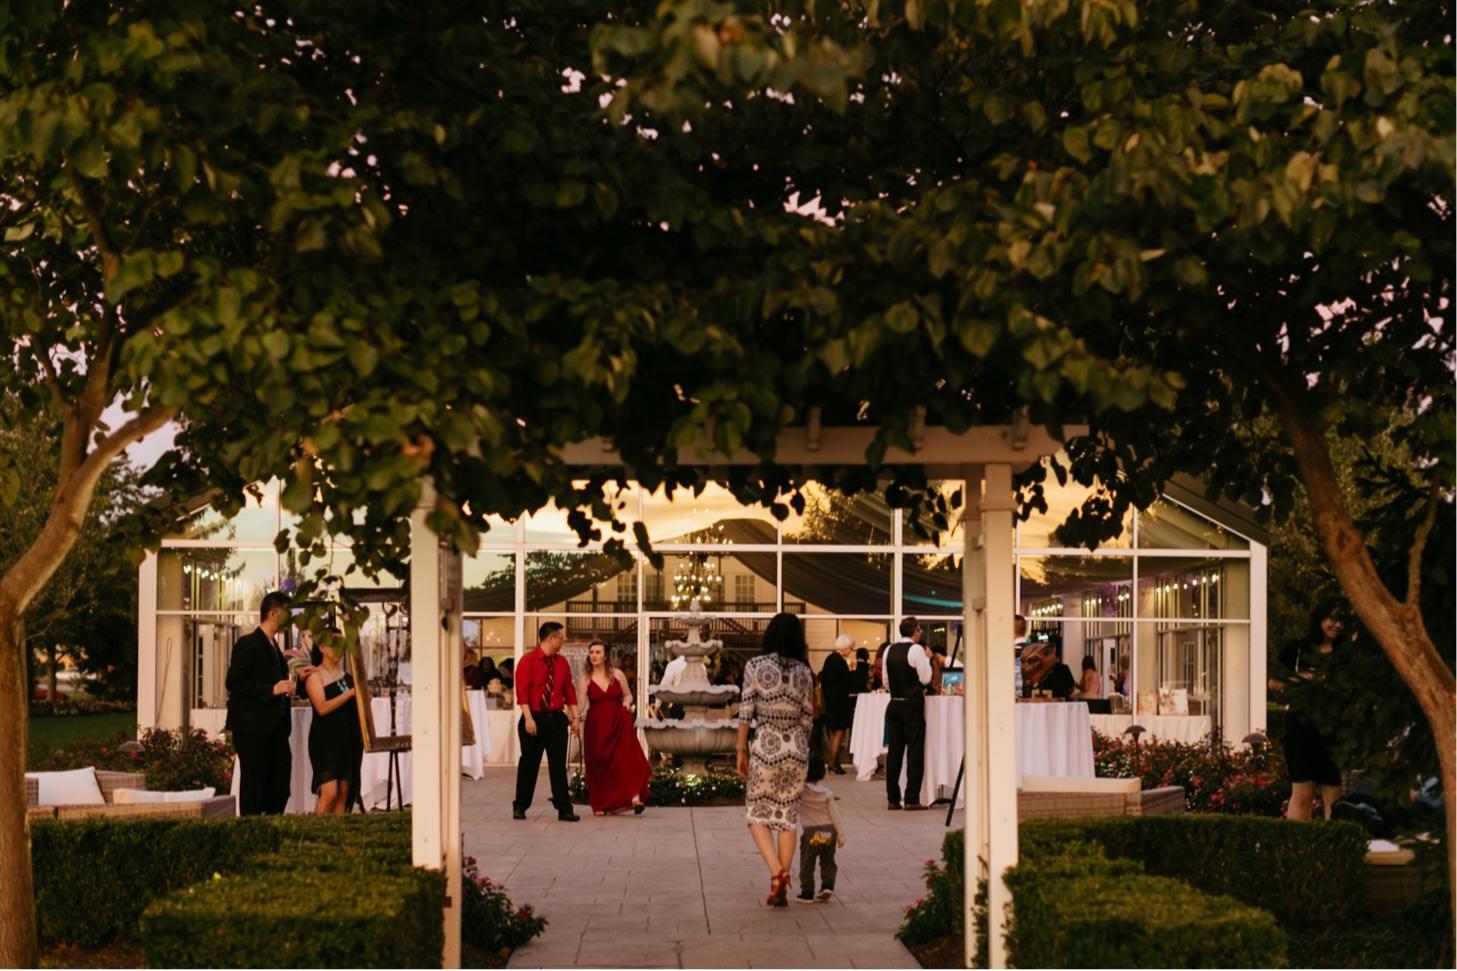 ritz-charles-wedding-reception-downtown-indianapolis-wedding-photographer059.JPG